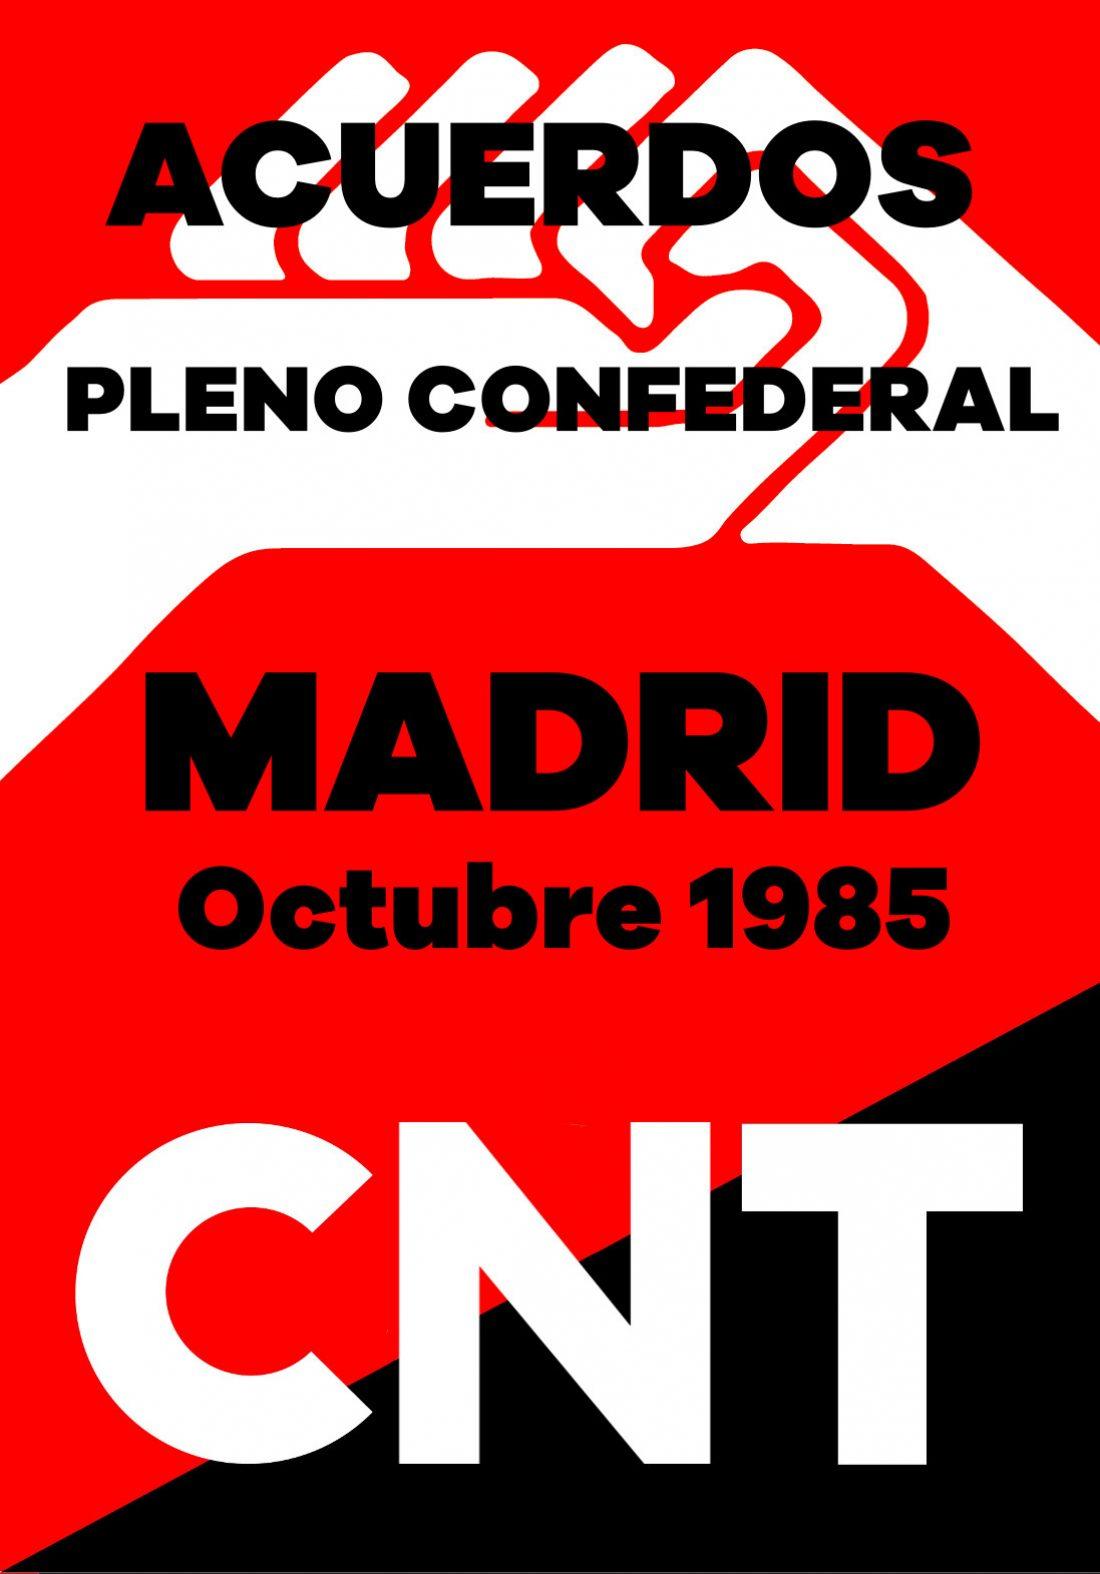 Pleno Confederal de Octubre de 1985